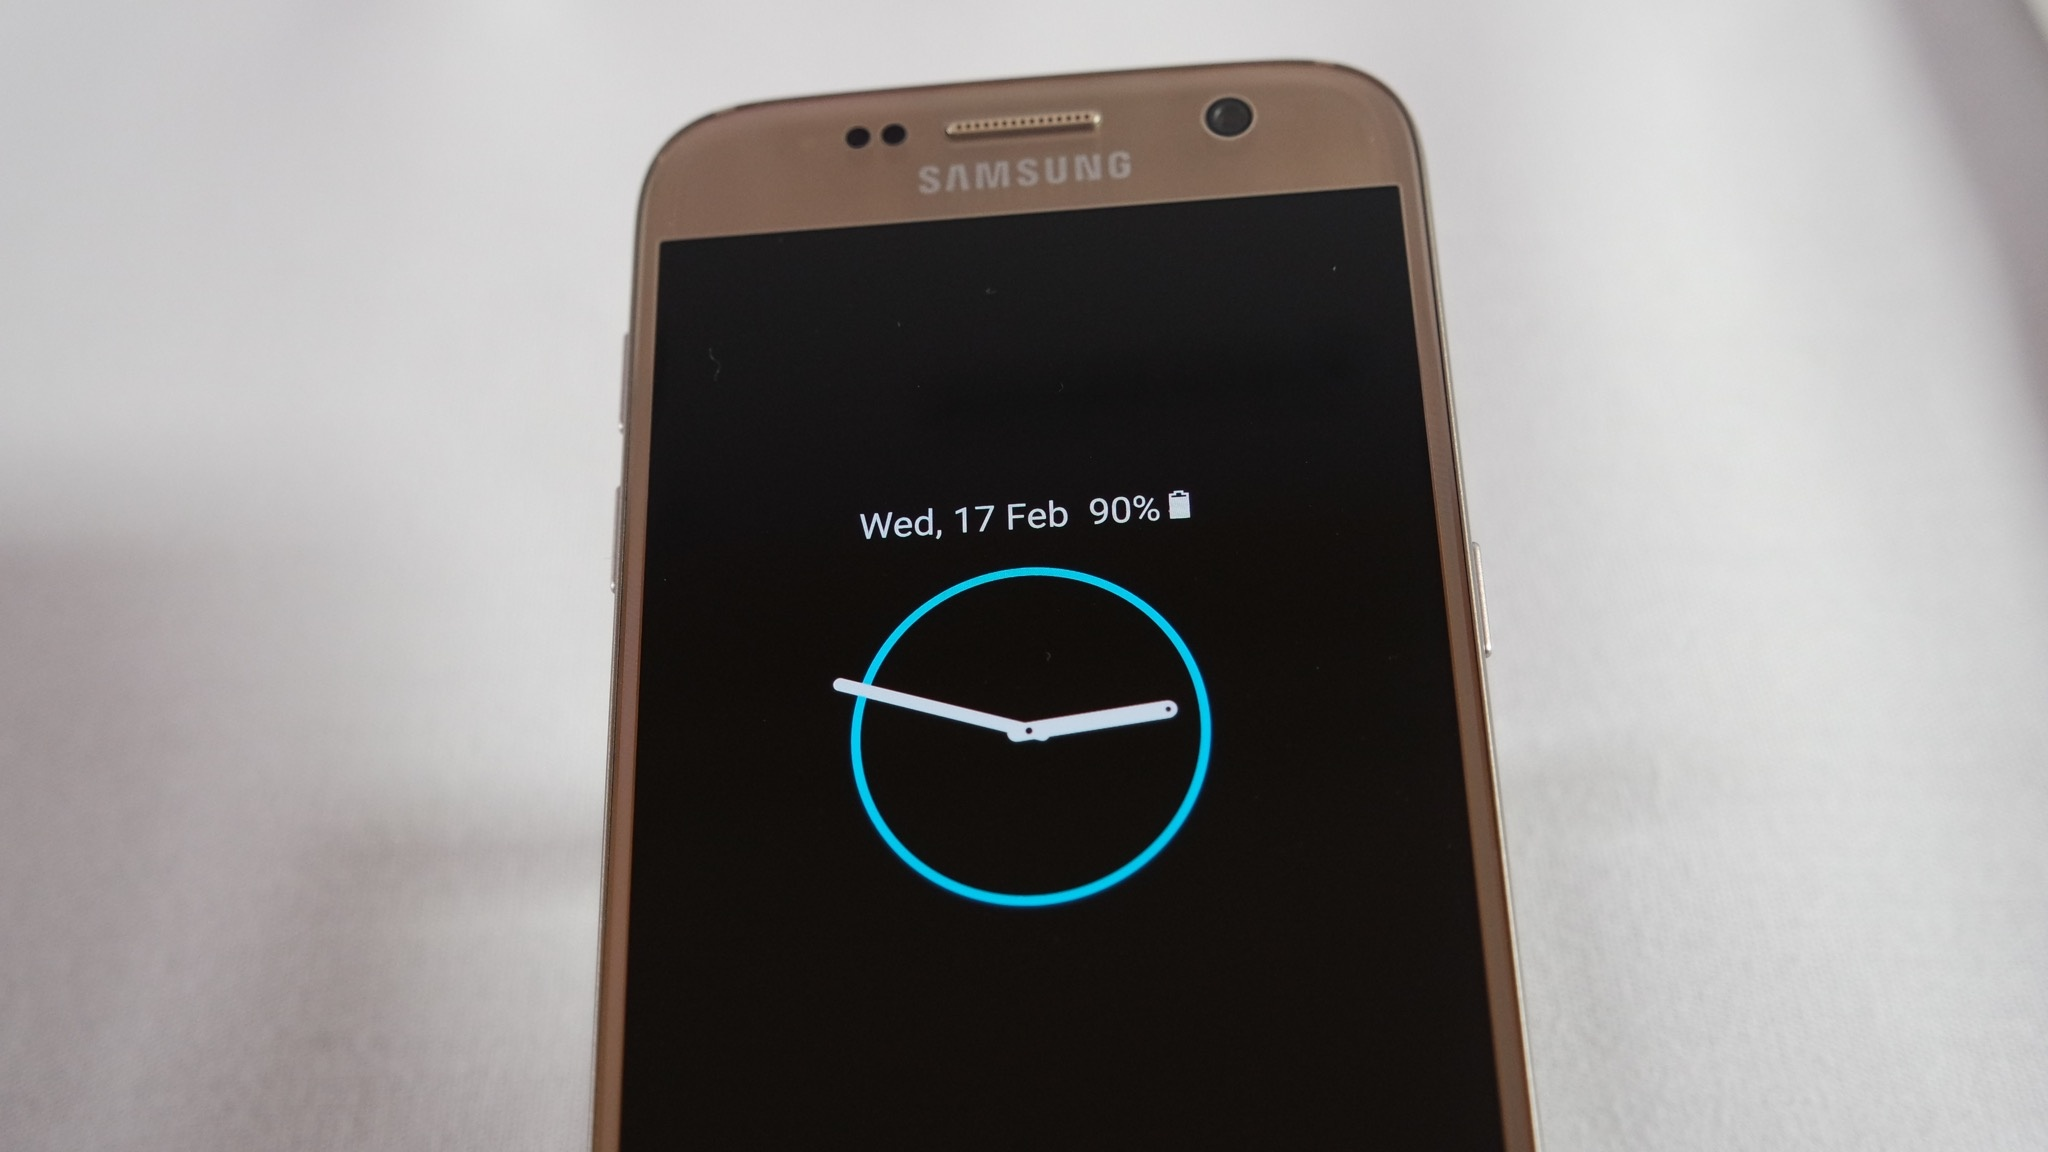 Samsung Galaxy S7 con función always on en pantalla